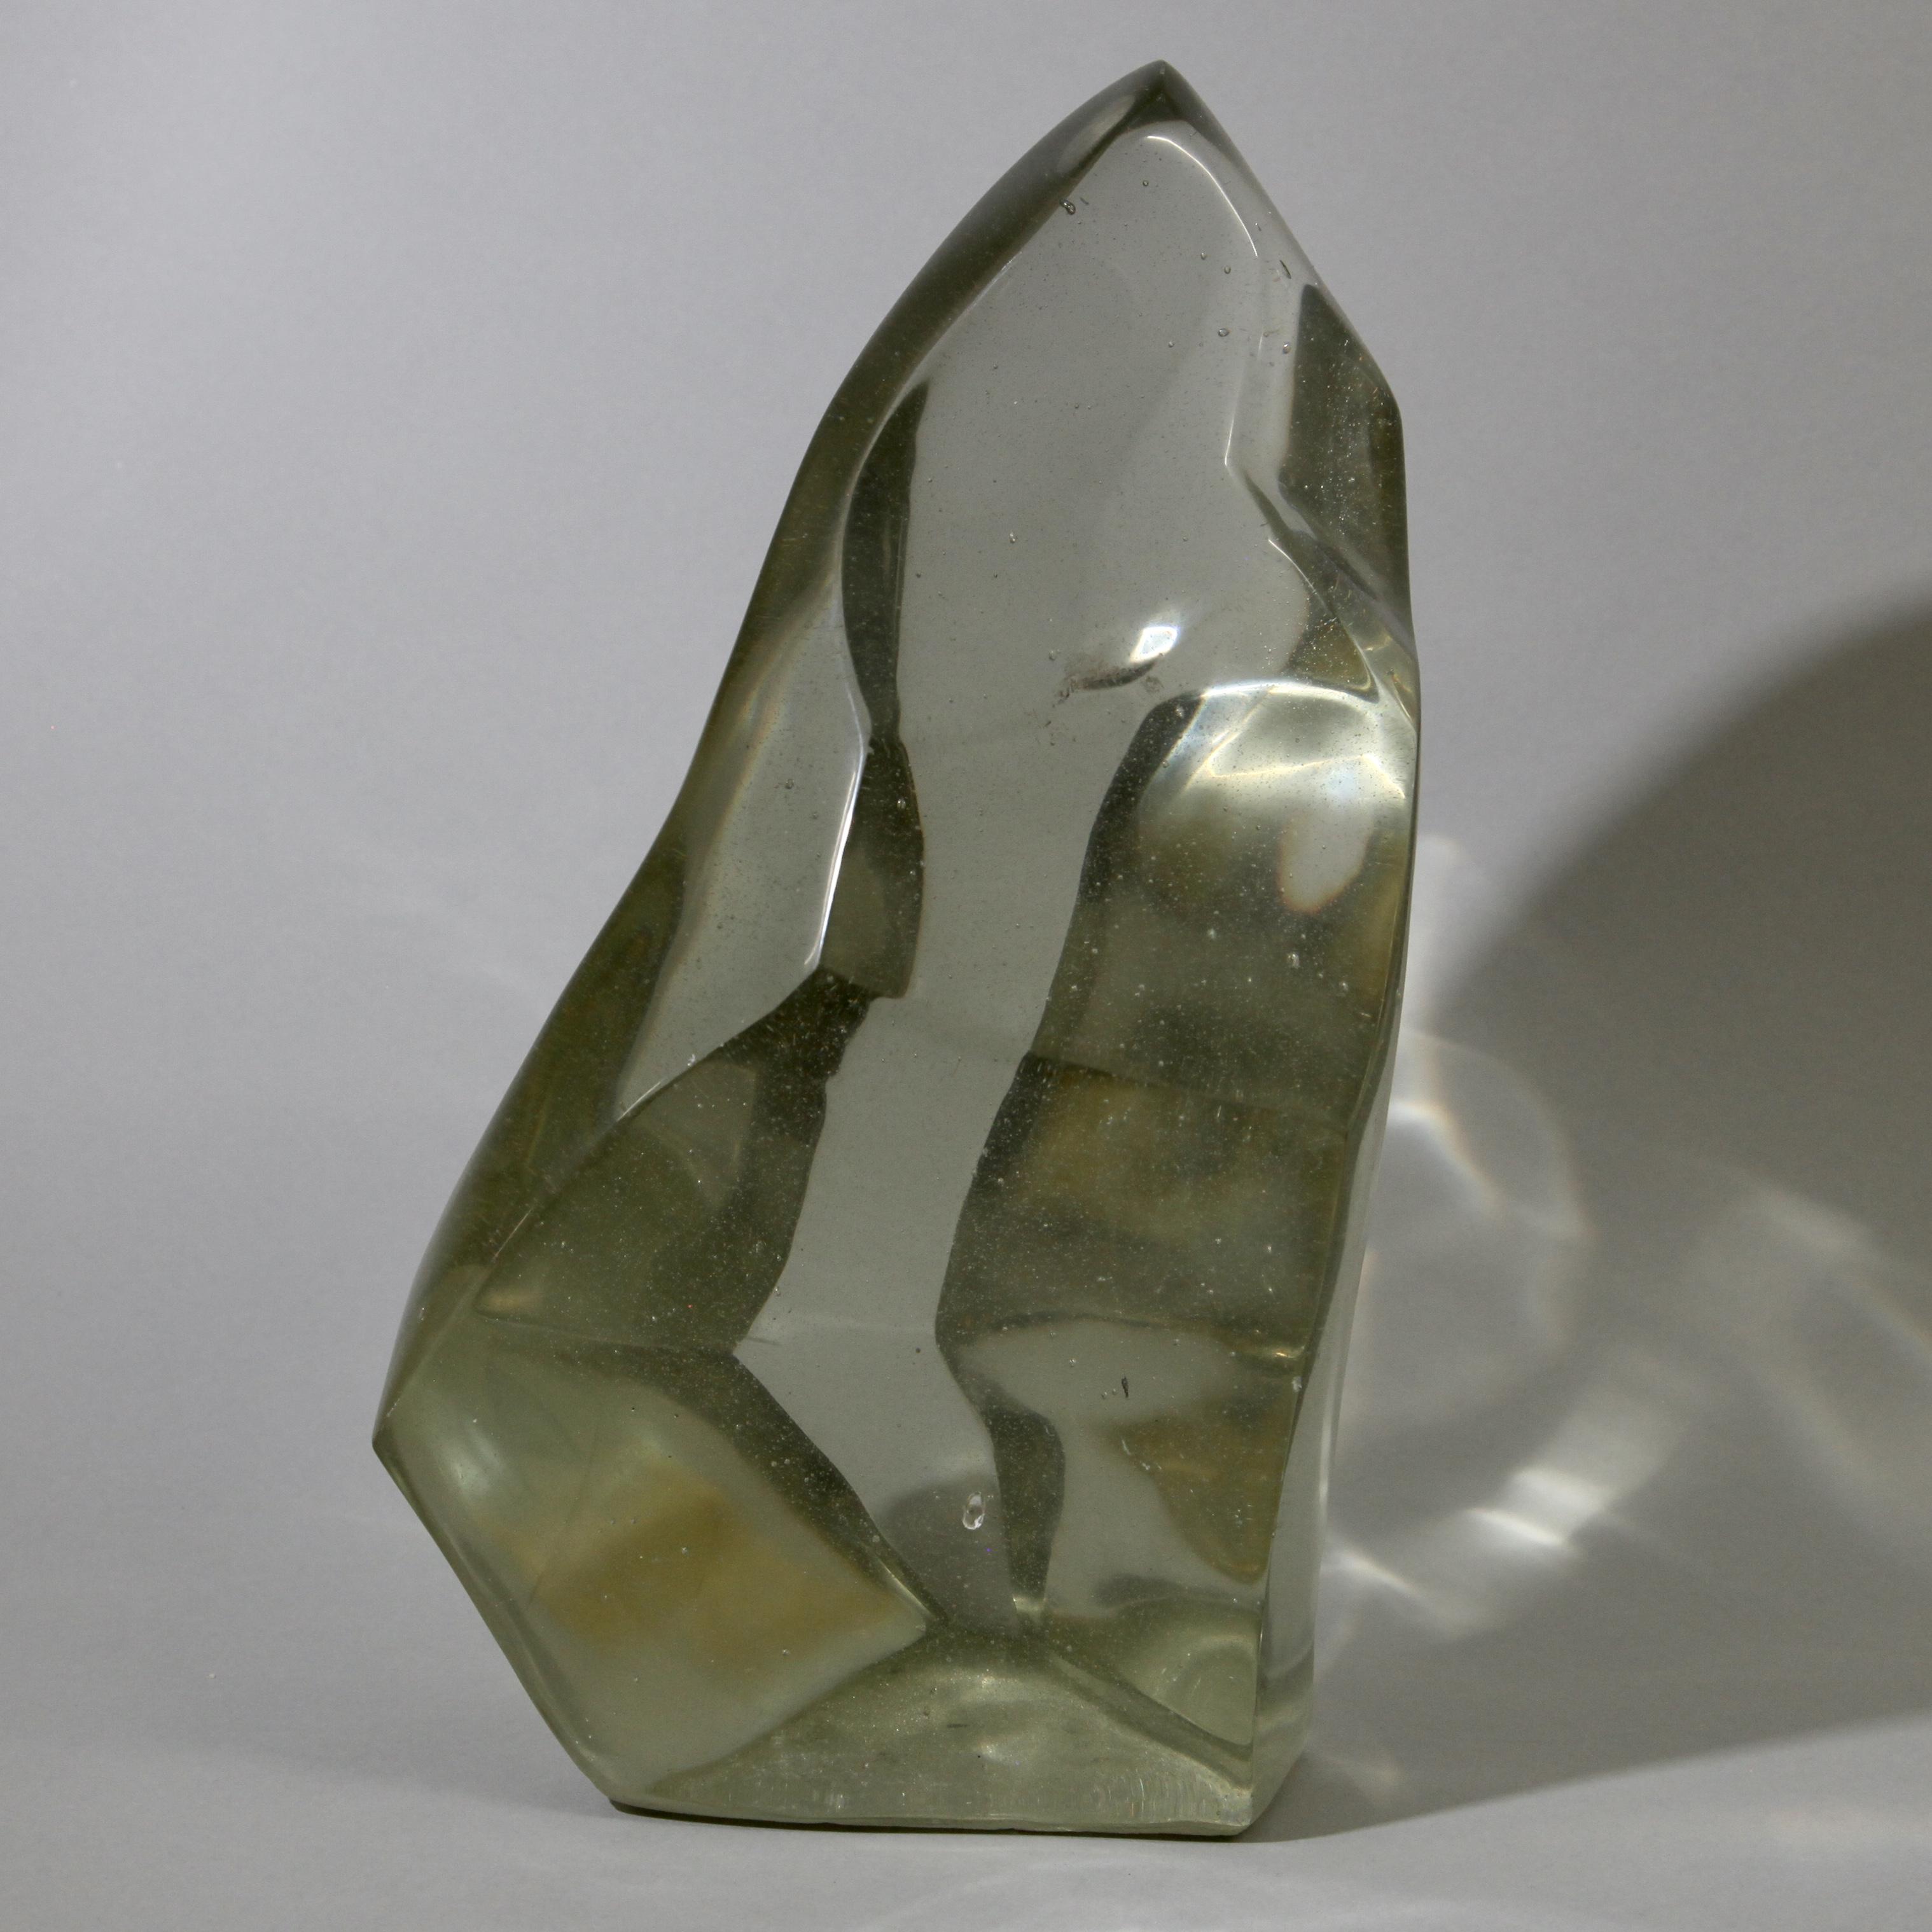 A CHAMPAGNE COLOURED GLASS SCULPTURE ( No 1076 )